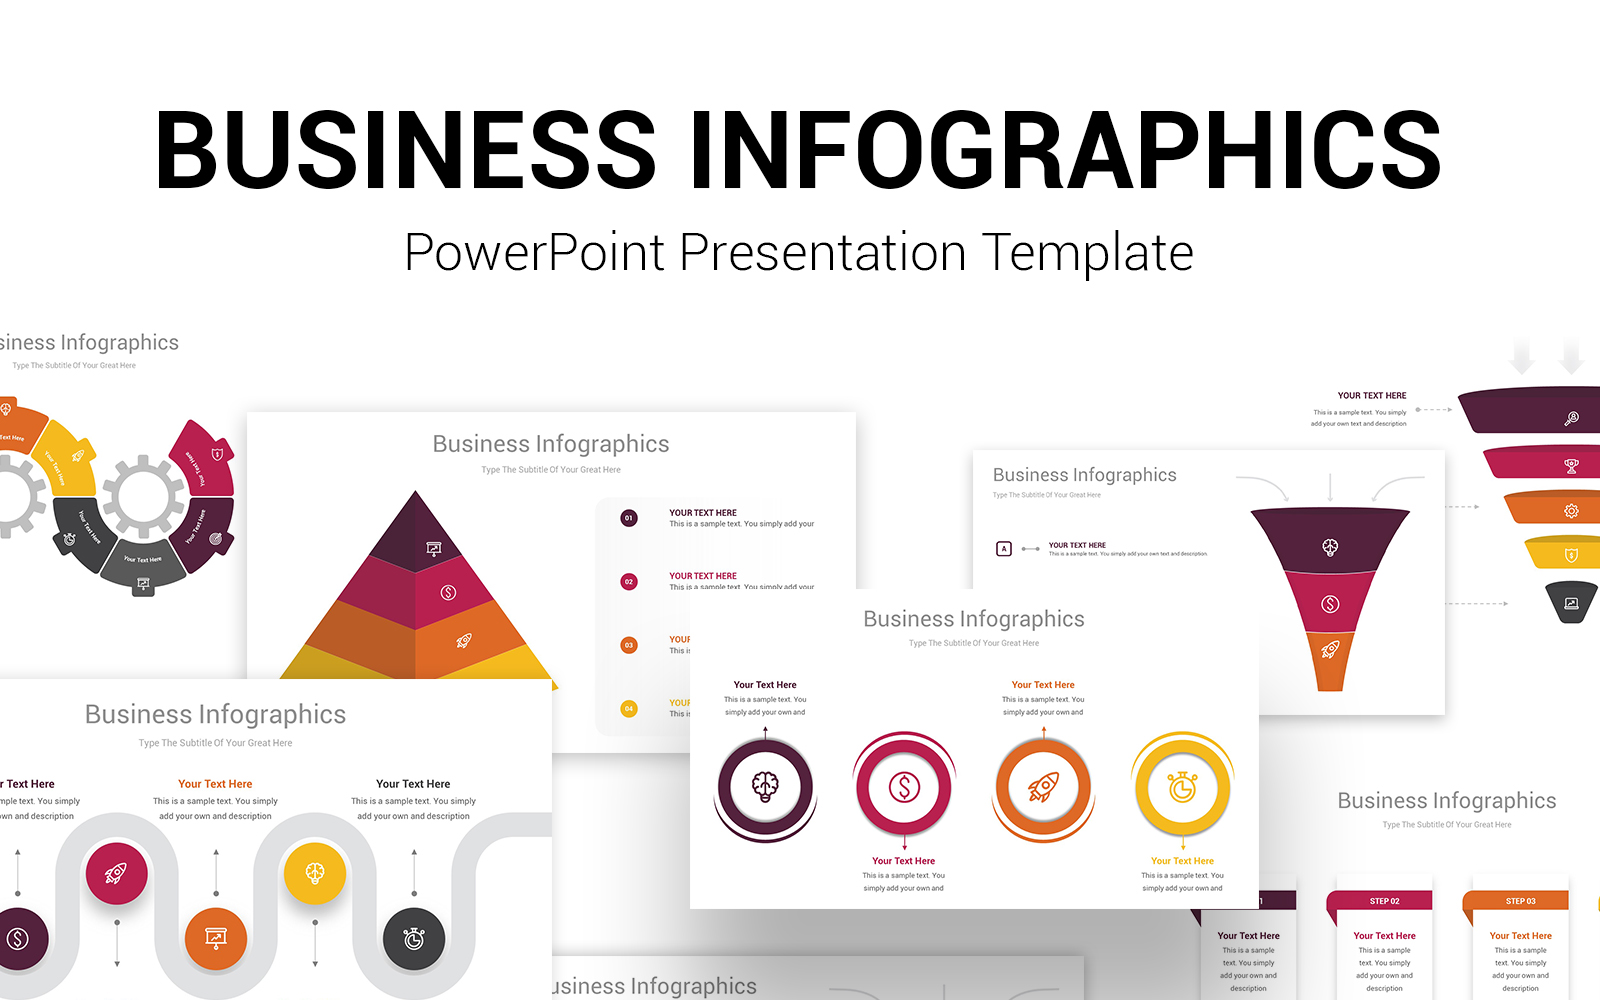 Biz Infographics PowerPoint PPT Template